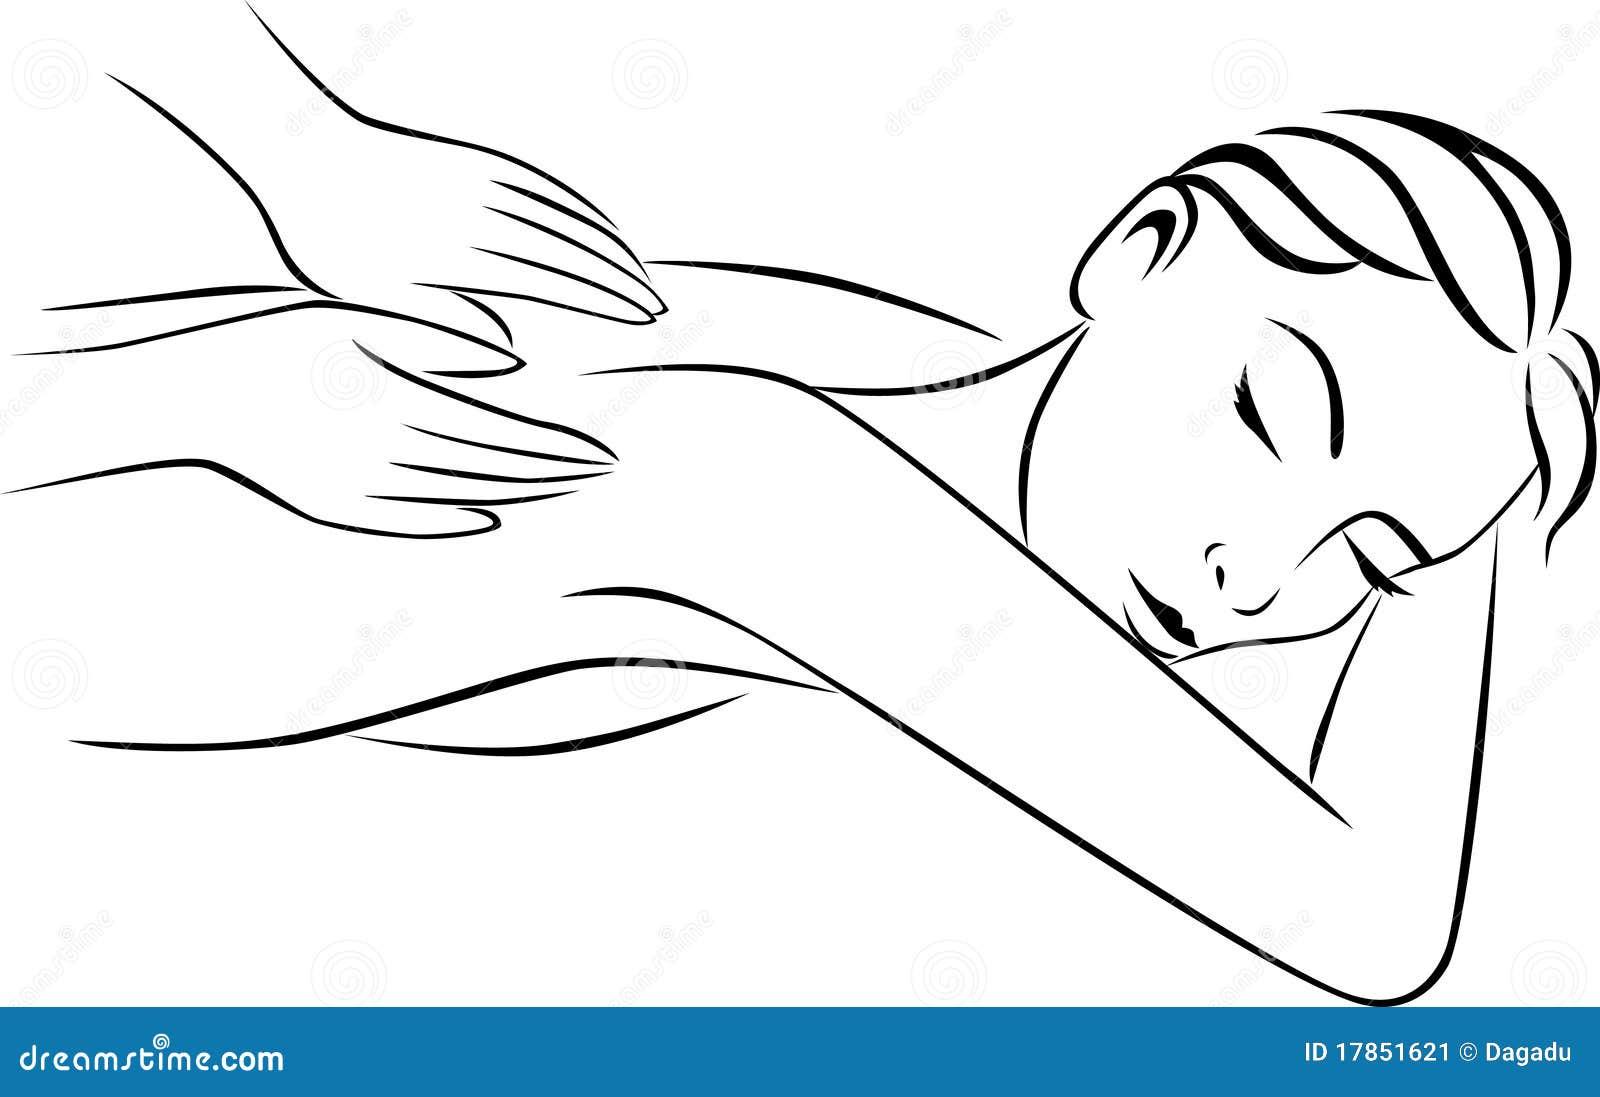 hand massage stock vector  illustration of massaging